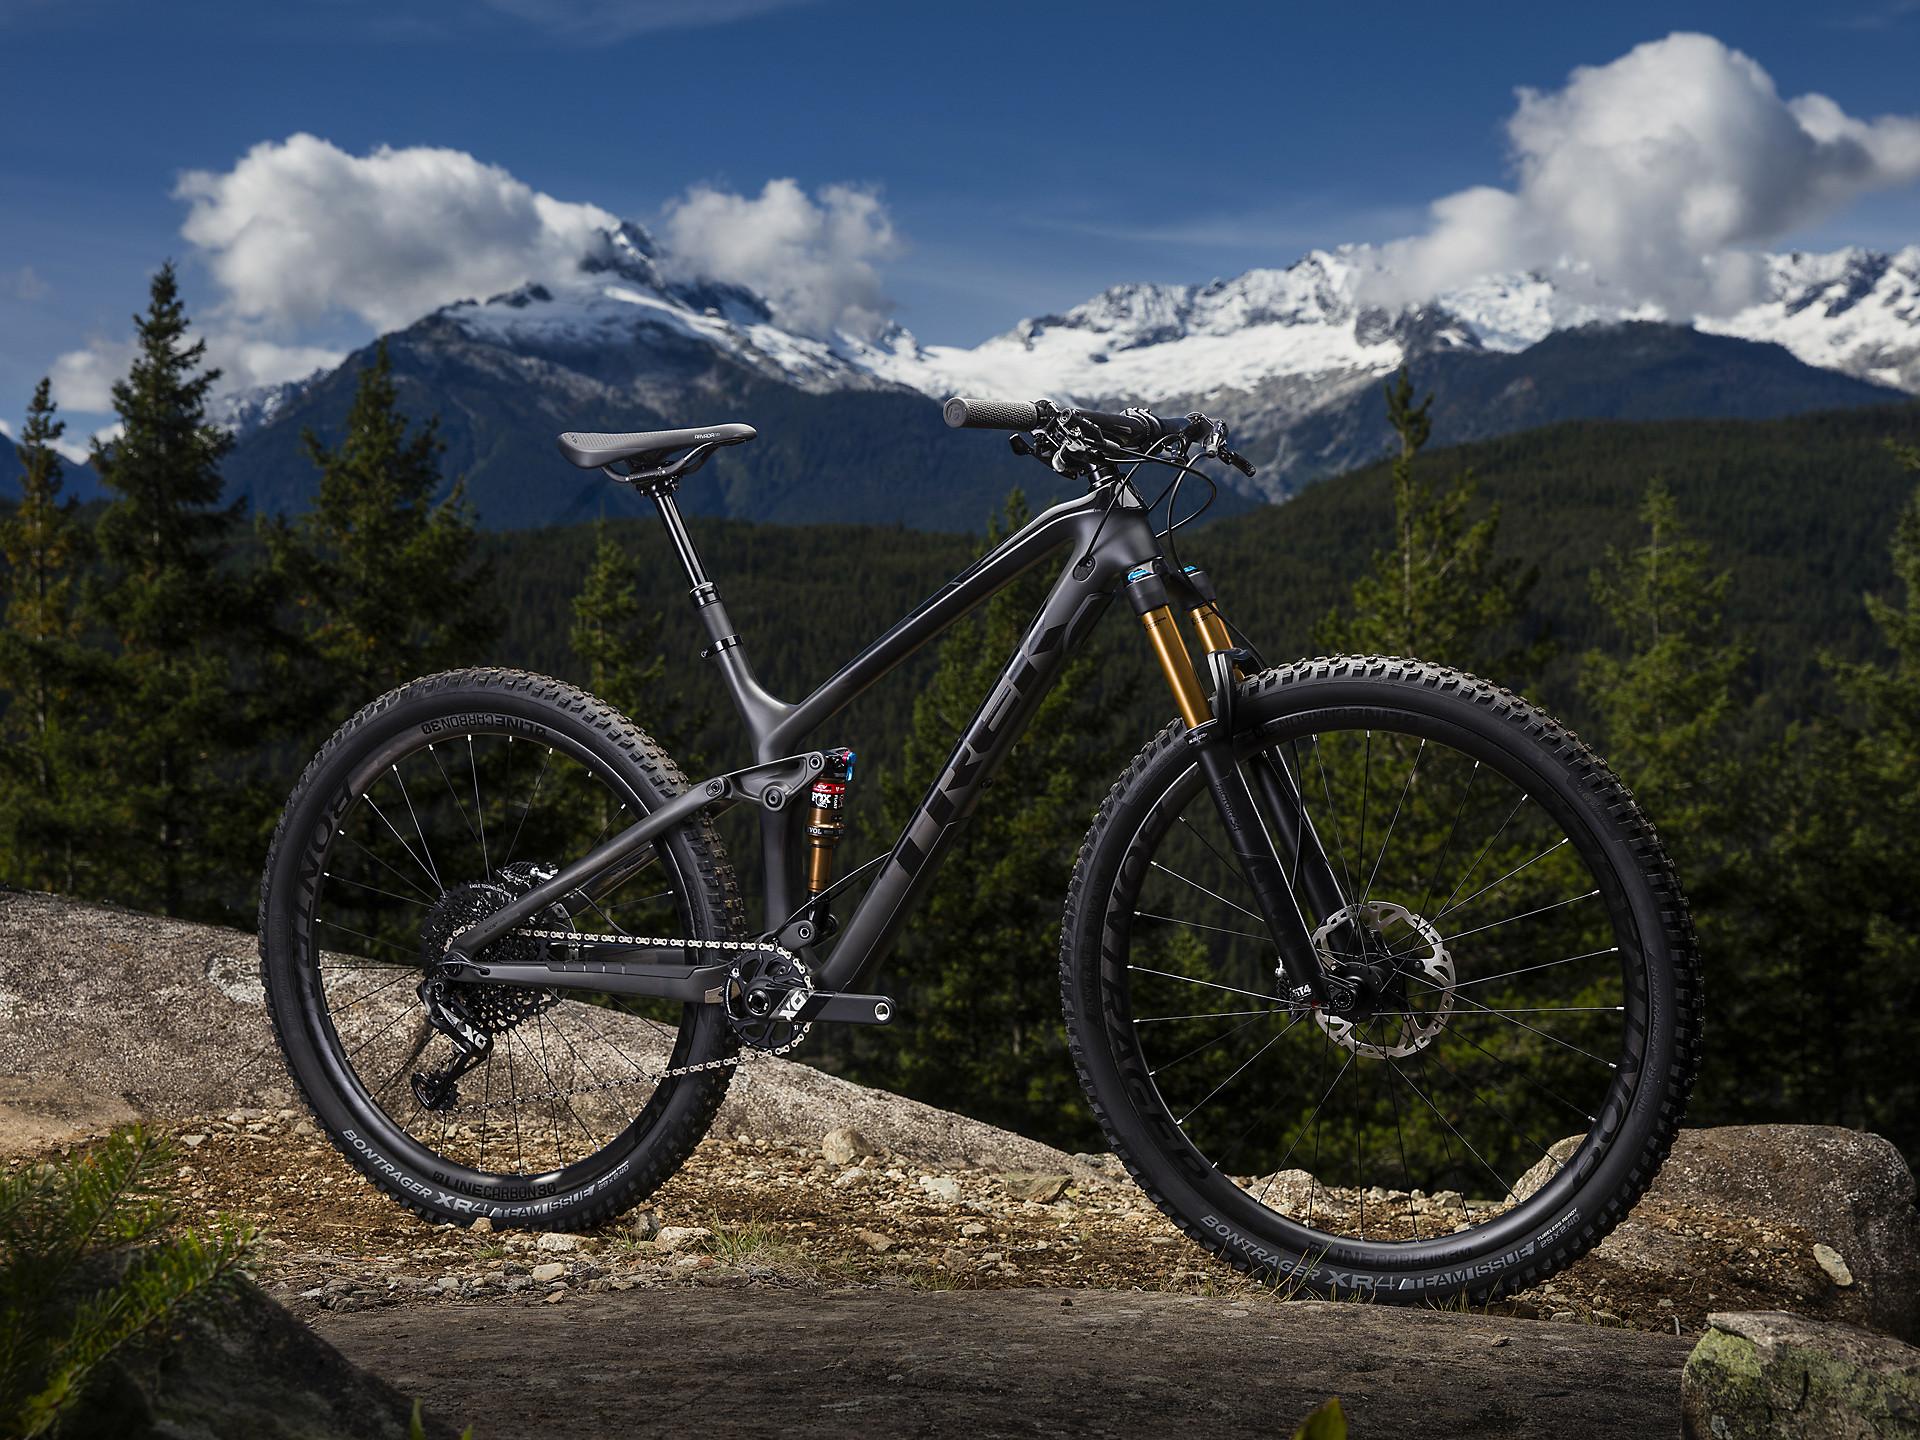 Carbon Road Bikes Trek Bikes >> Fuel Ex 9 9 29 Trek Bikes